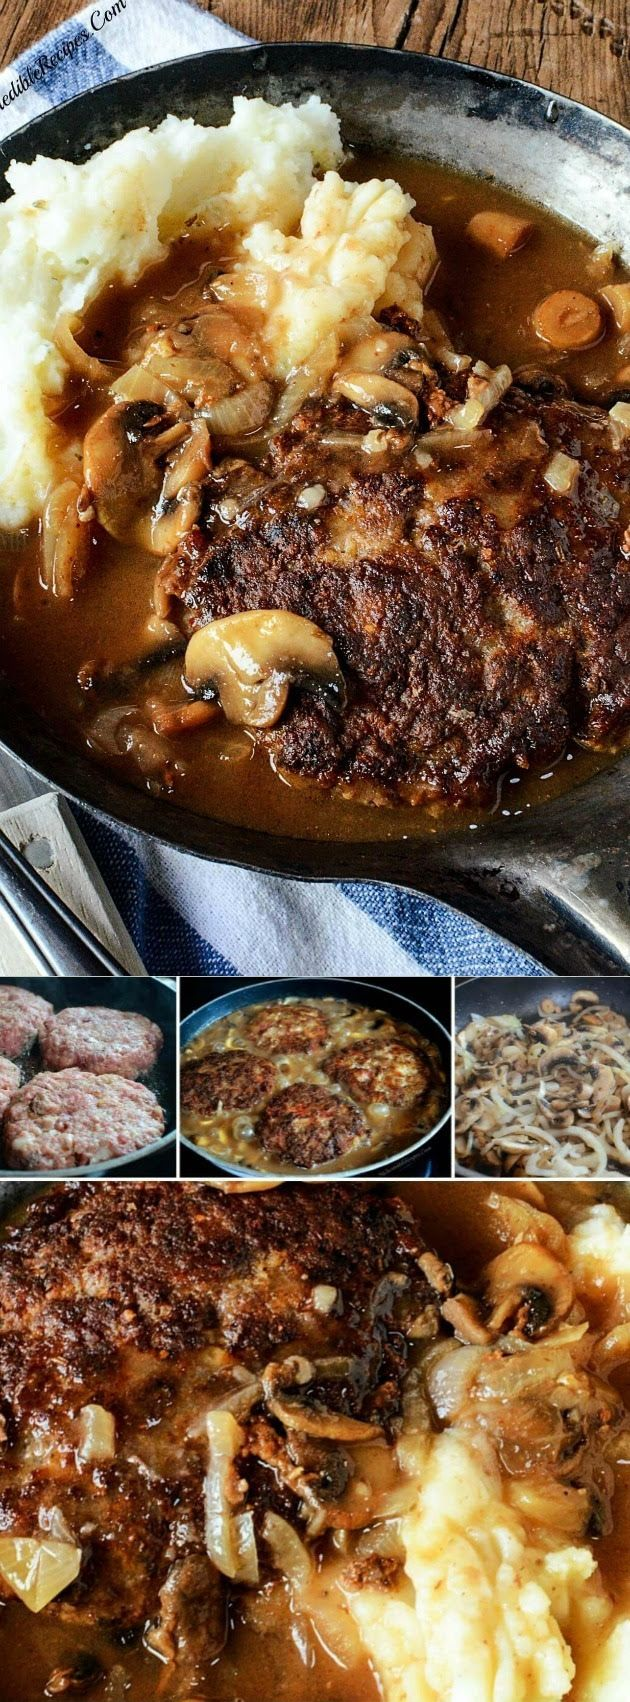 southern hamburger steaks with onion mushroom gravy recipe